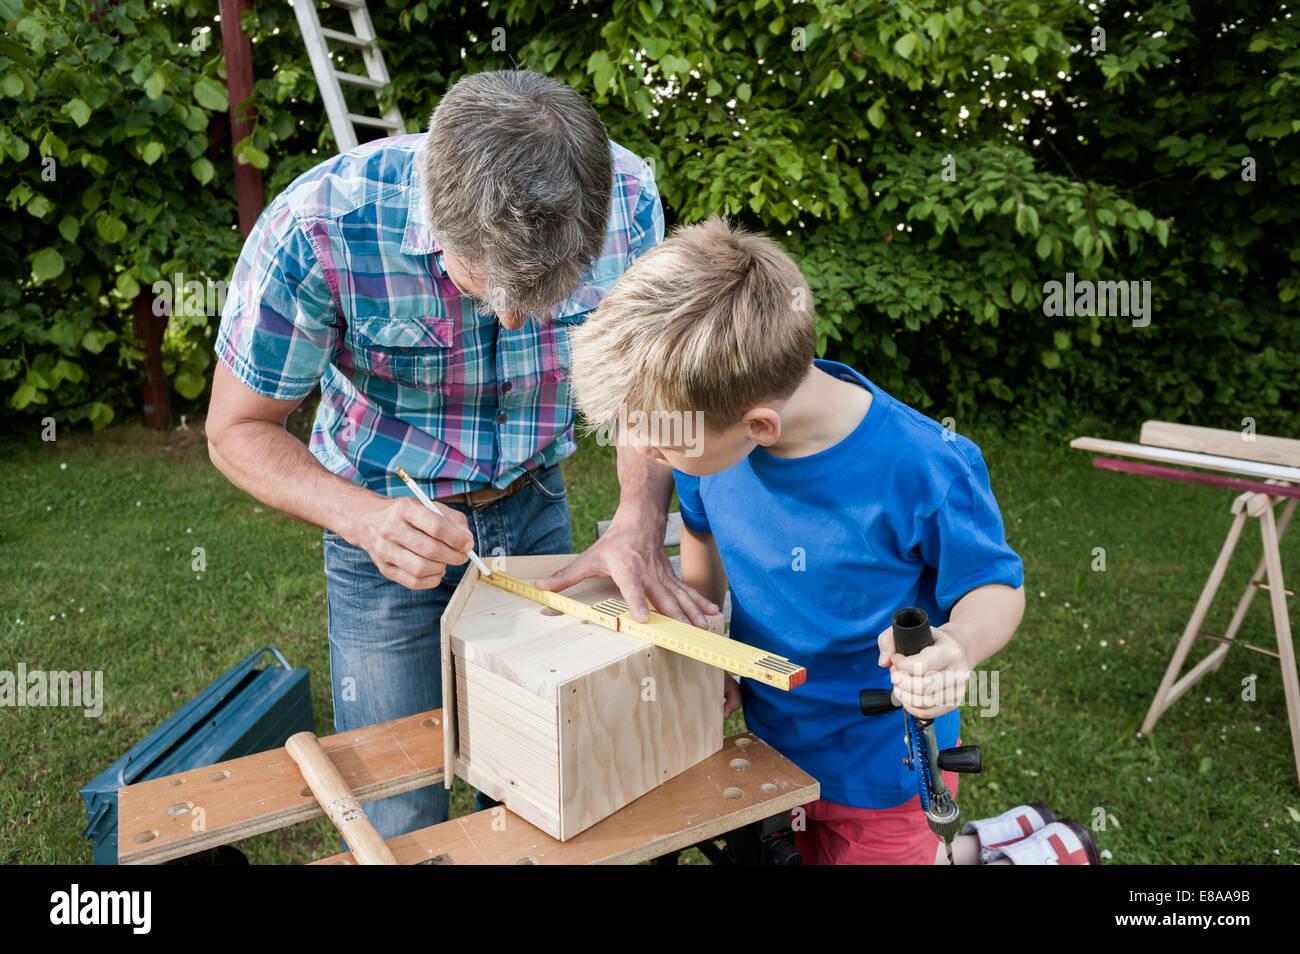 Messung der Holz Vogelhaus bauen Vater Sohn Stockbild